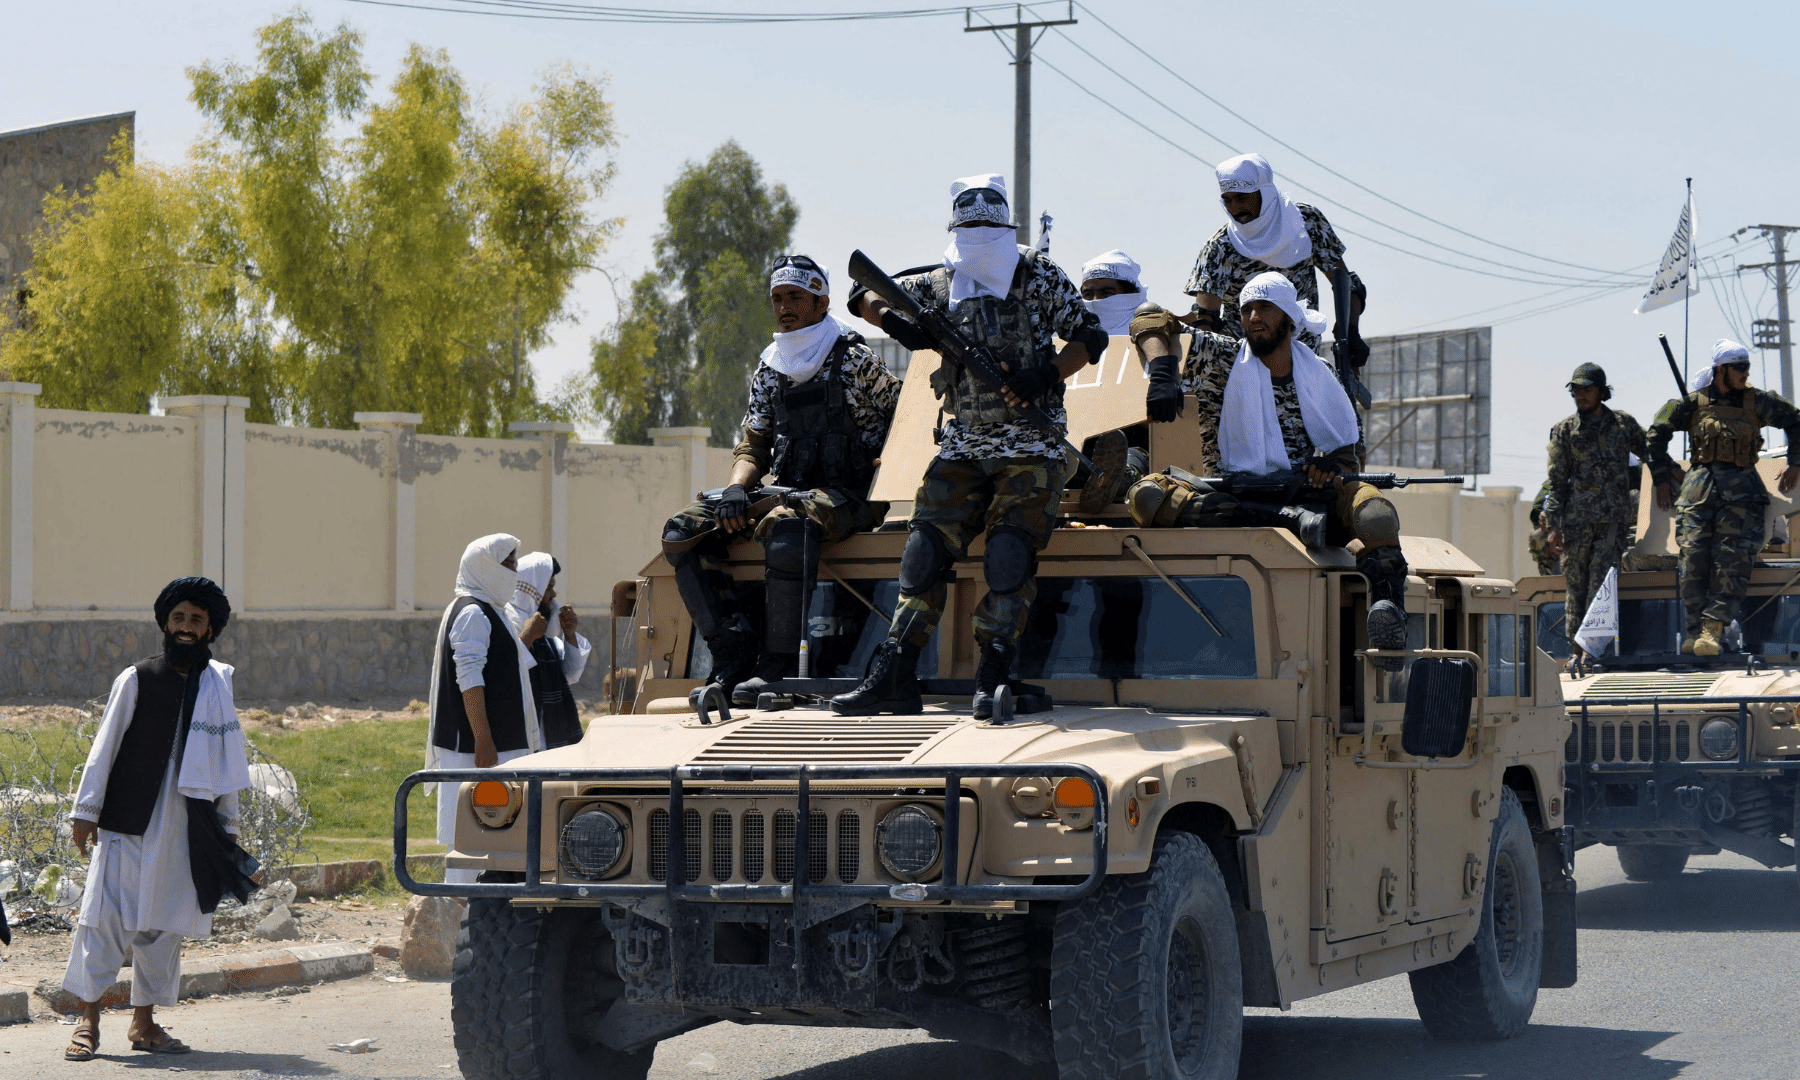 Taliban fighters atop Humvee vehicles parade along a road in Kandahar.